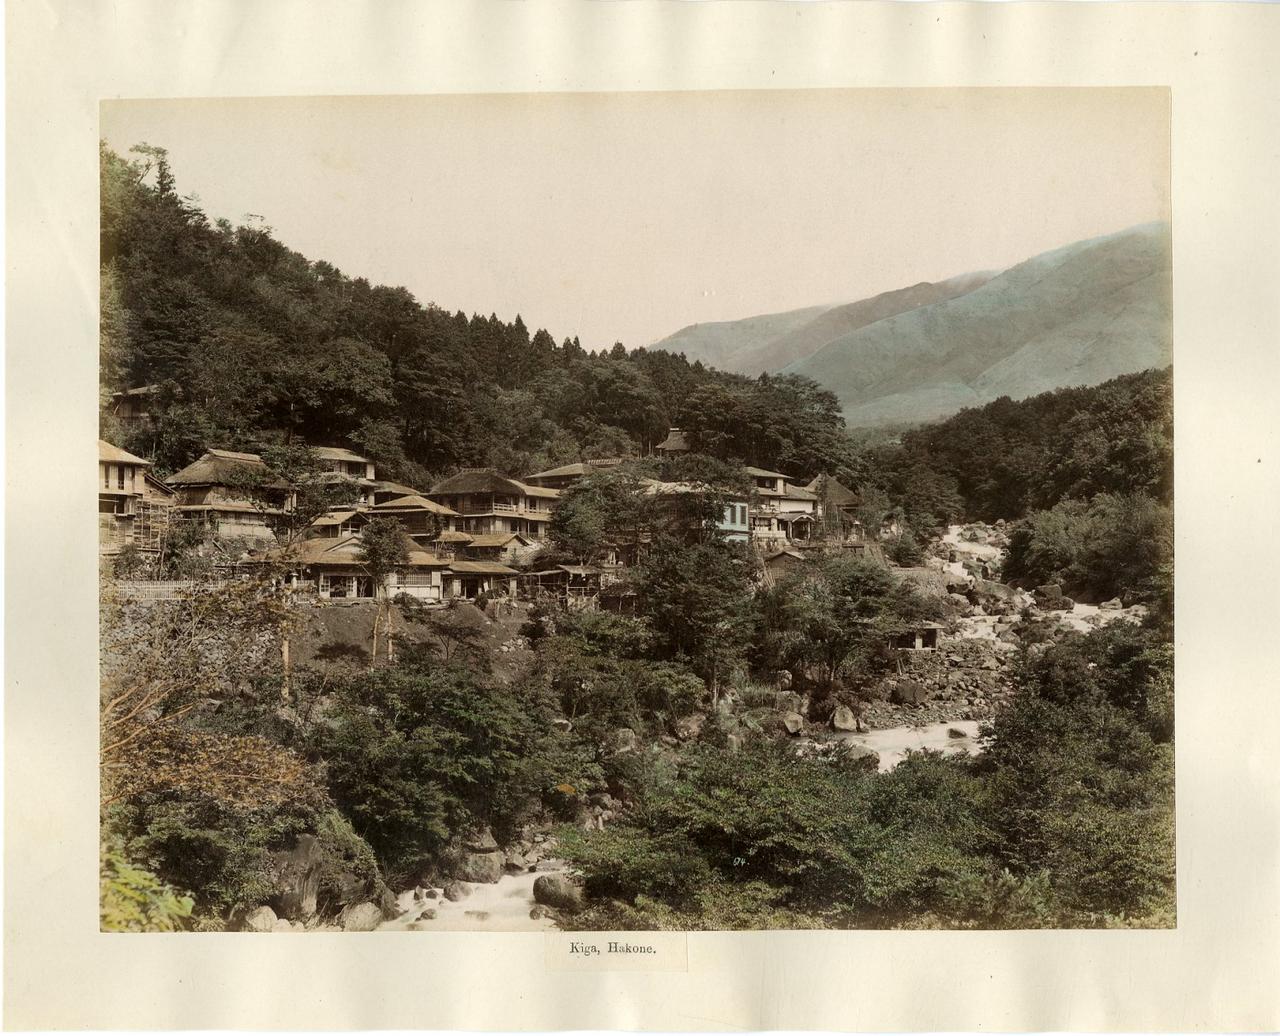 Кига. Хаконэ